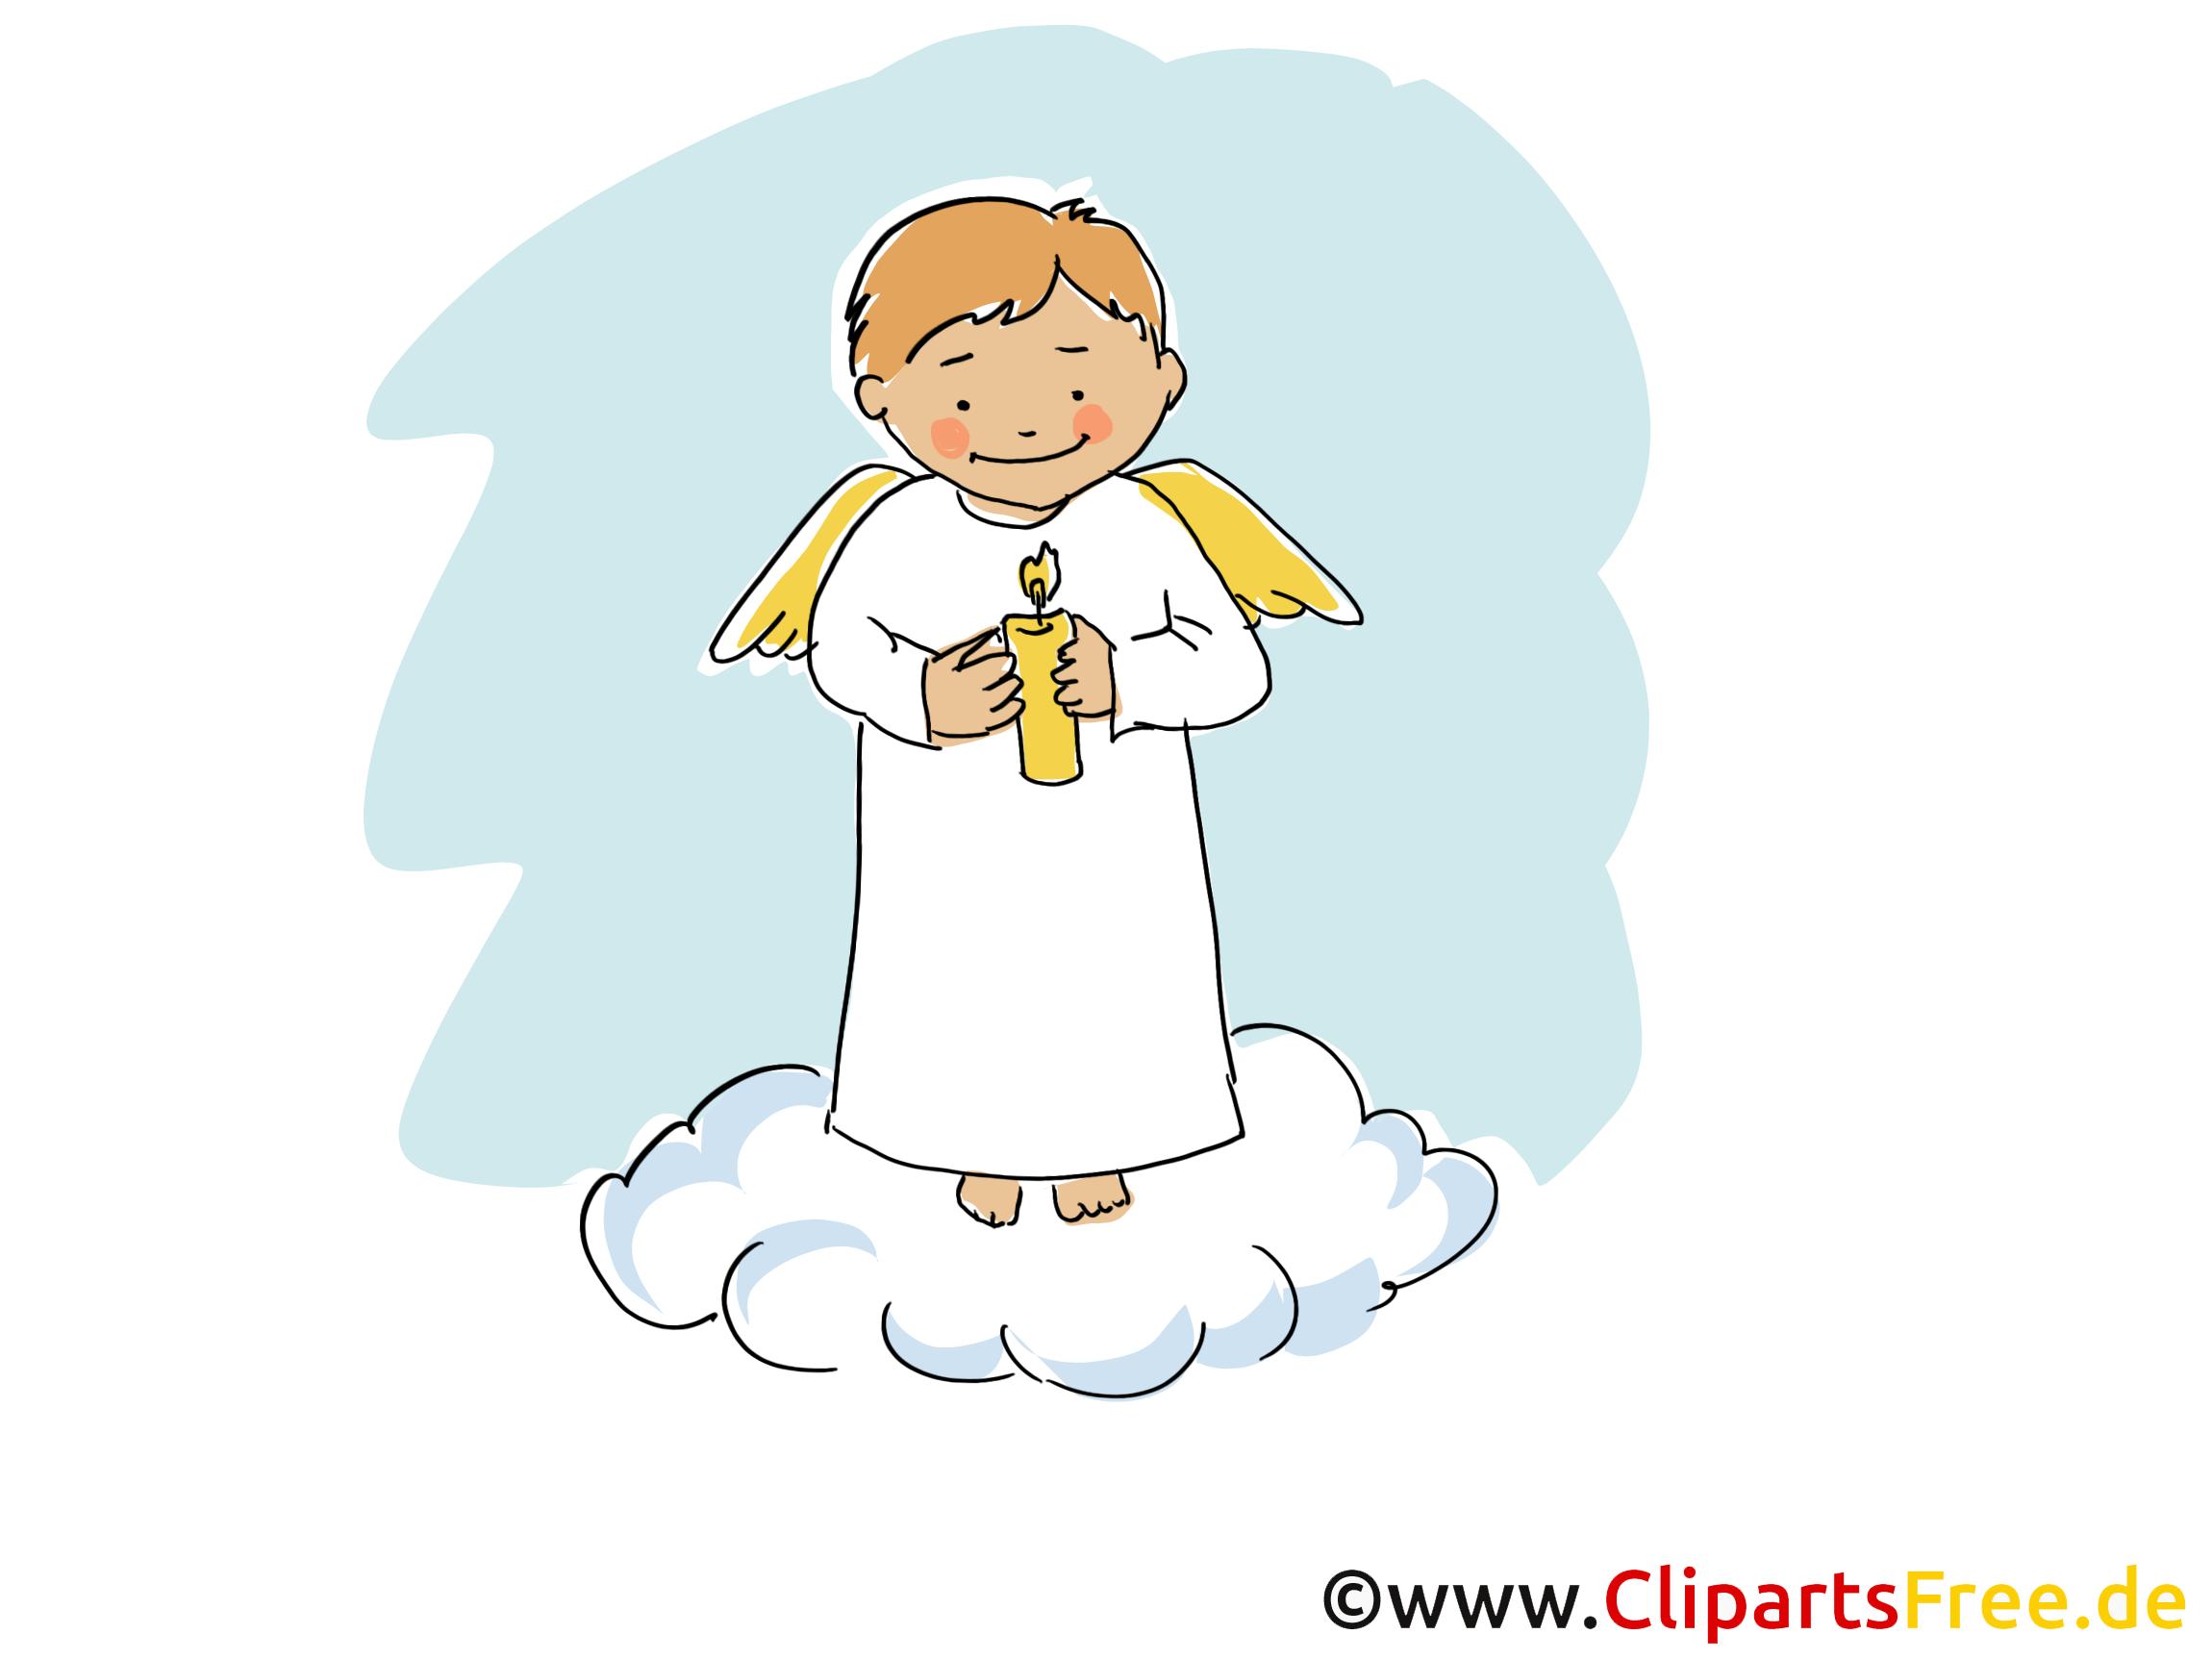 Einladung Taufe Karte, Clipart, Bild, Grafik, Cartoon, Illustration  Kostenlos